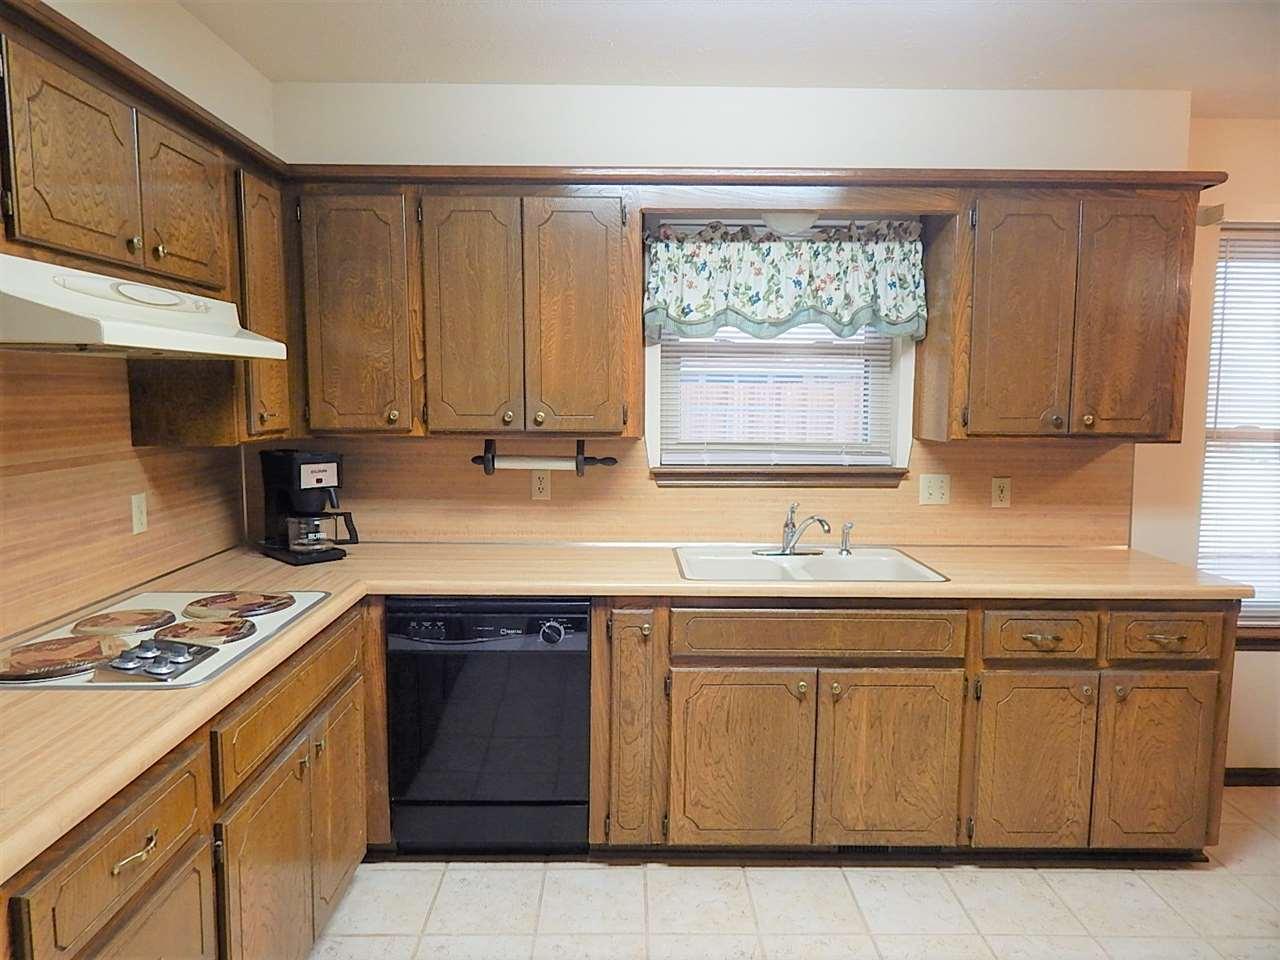 Sold Cross Sale W/ MLS | 2113 Berkshire  Ponca City, OK 74604 6